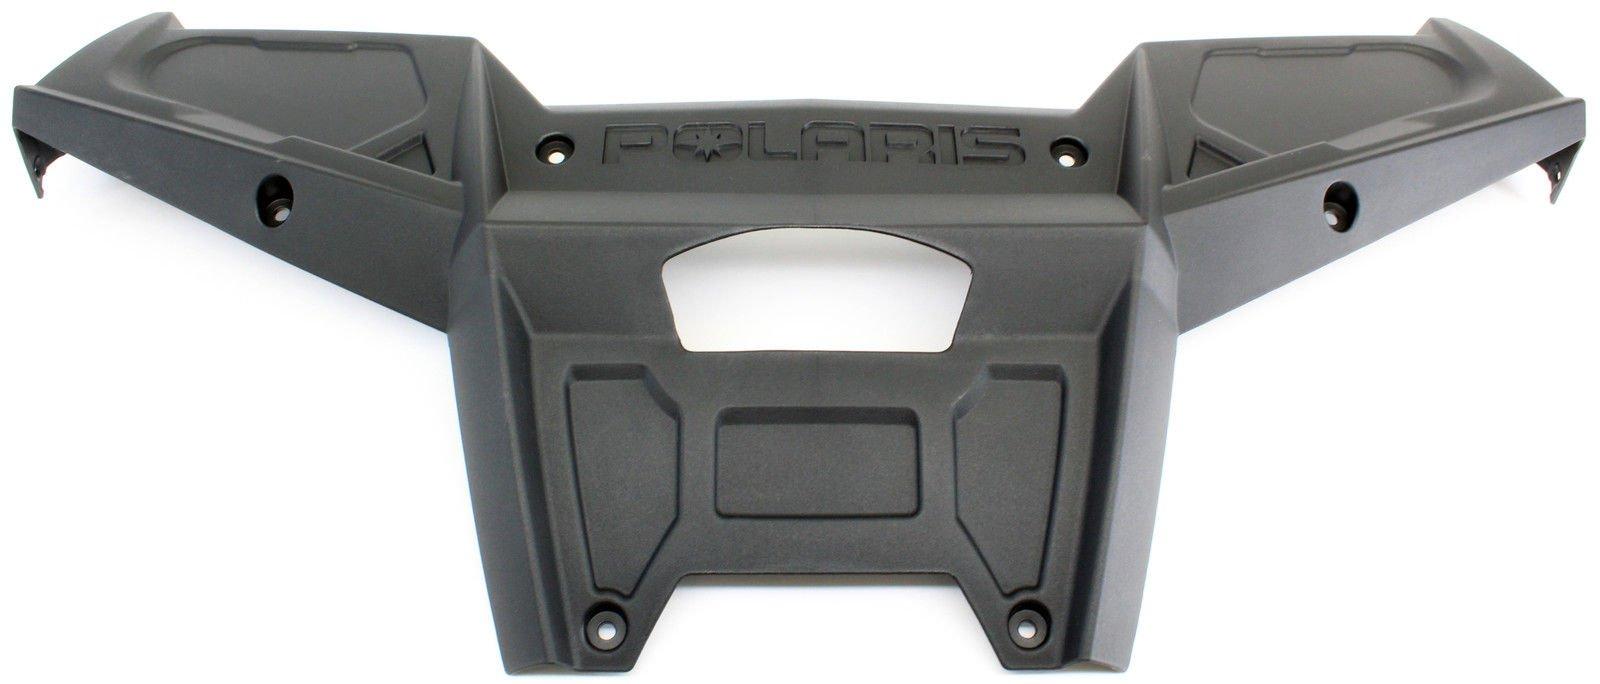 Polaris 2009-2017 09-17 RZR Razor Rear Black Bumper 0454294-070 New OEM